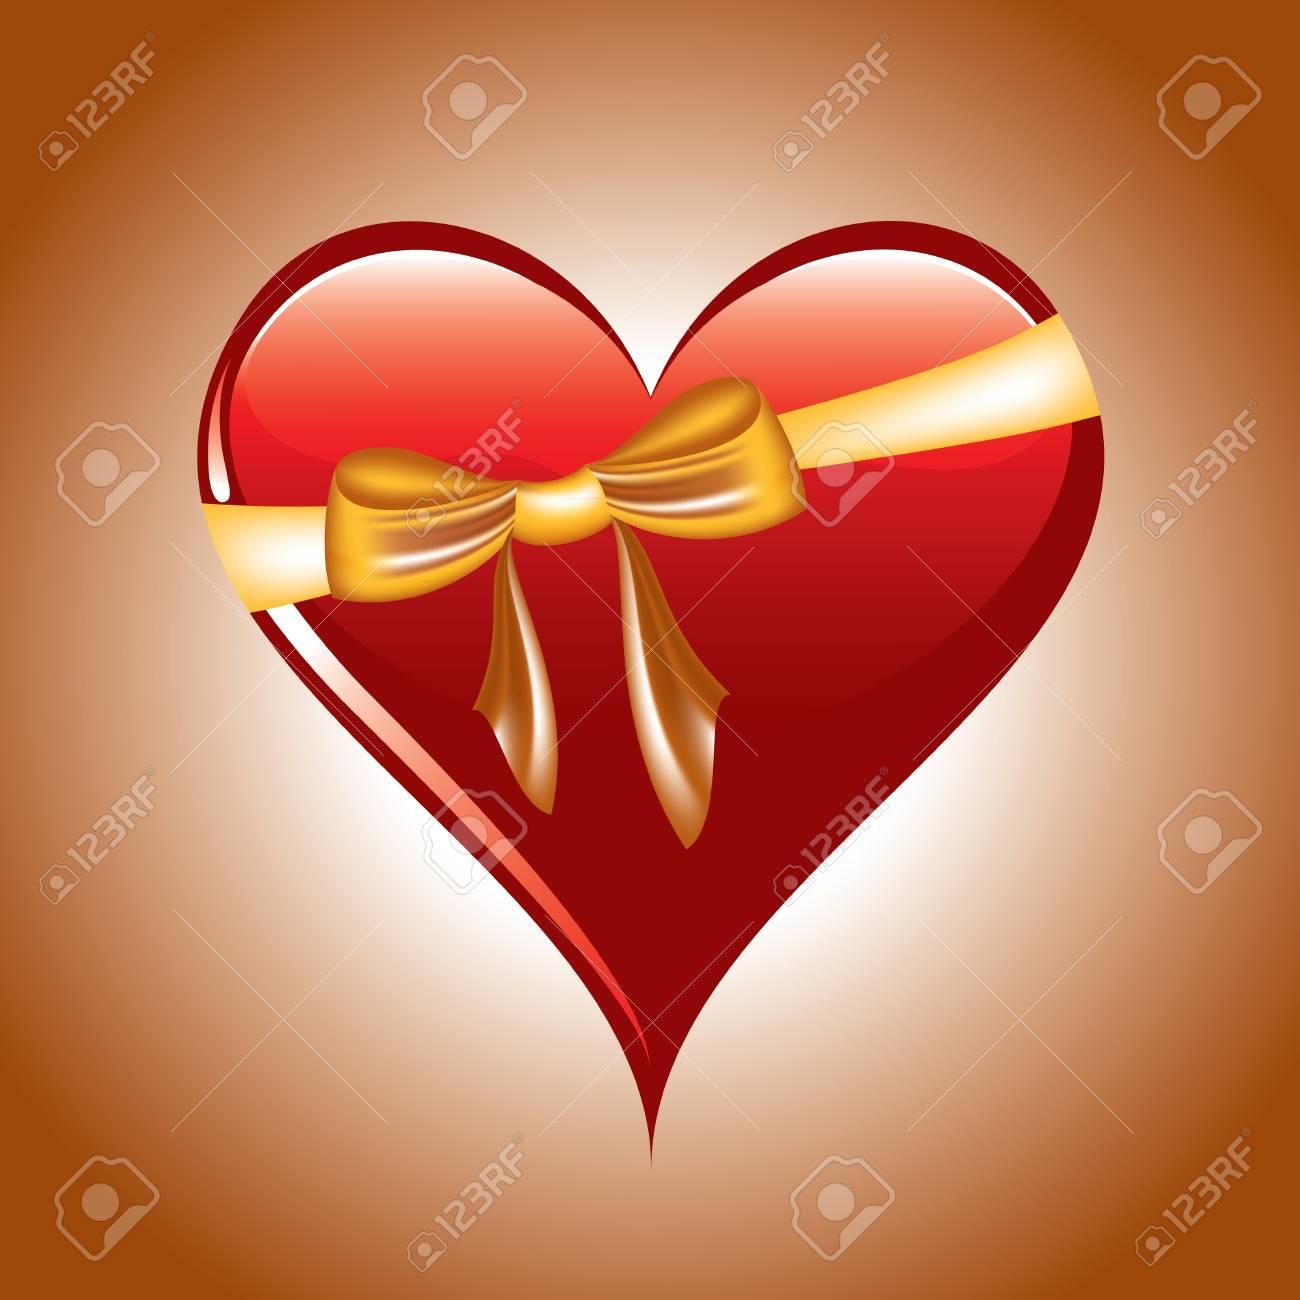 Heart  Illustration Stock Vector - 14602689